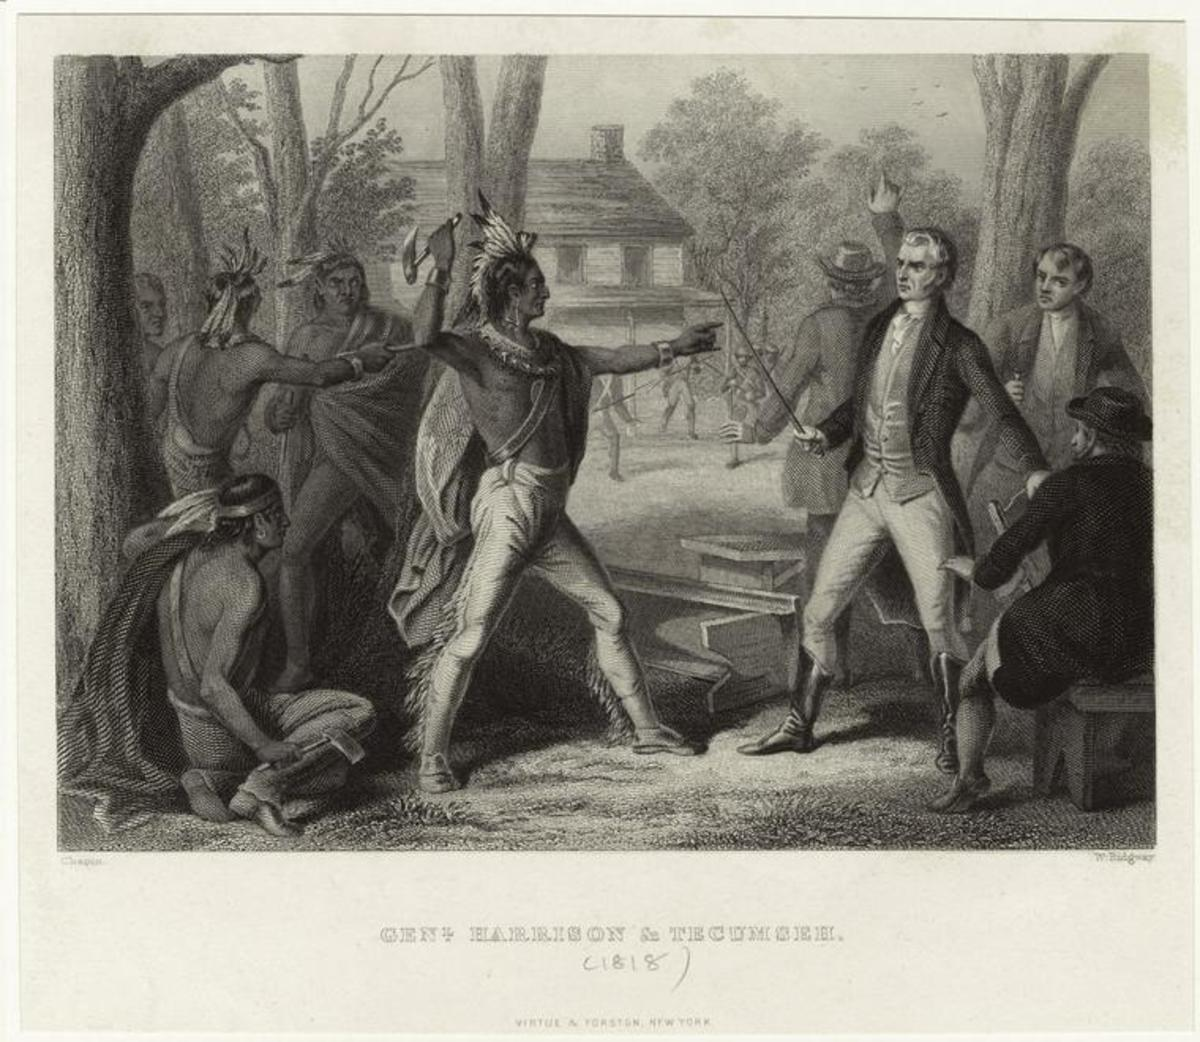 Engraving of Tecumseh challenging William Henry Harrison